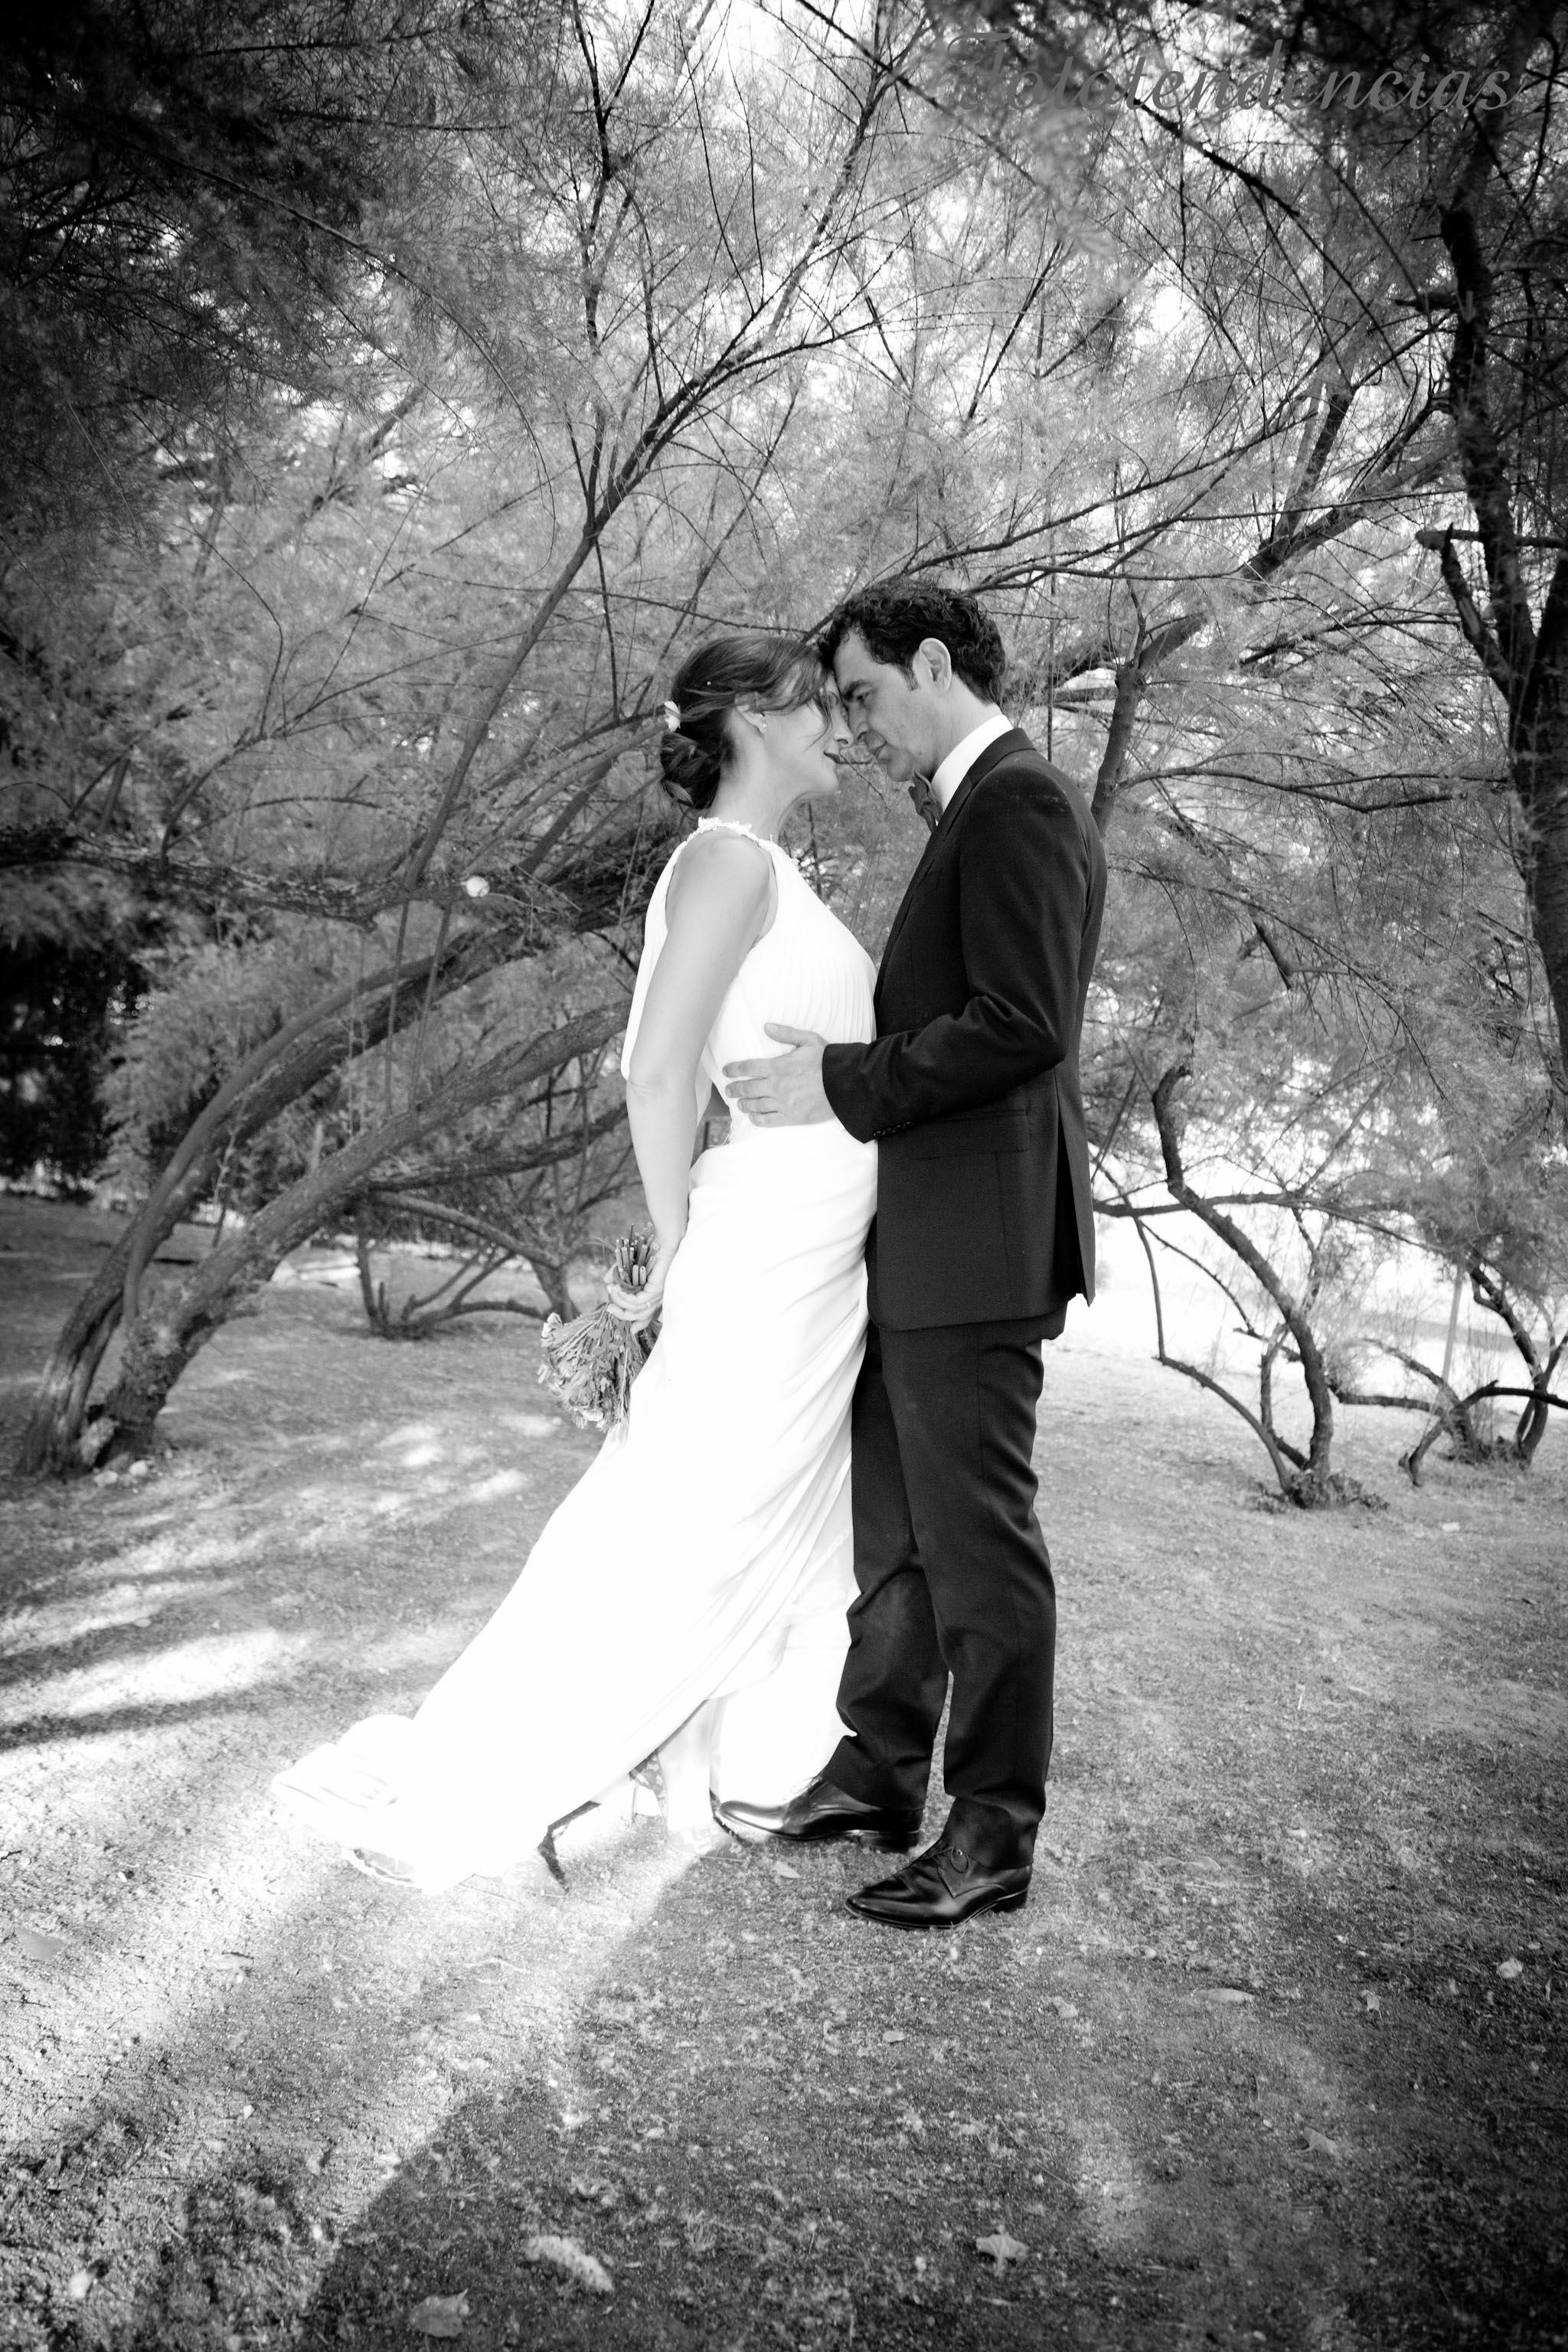 Fototendencias Eva y Arturo 03